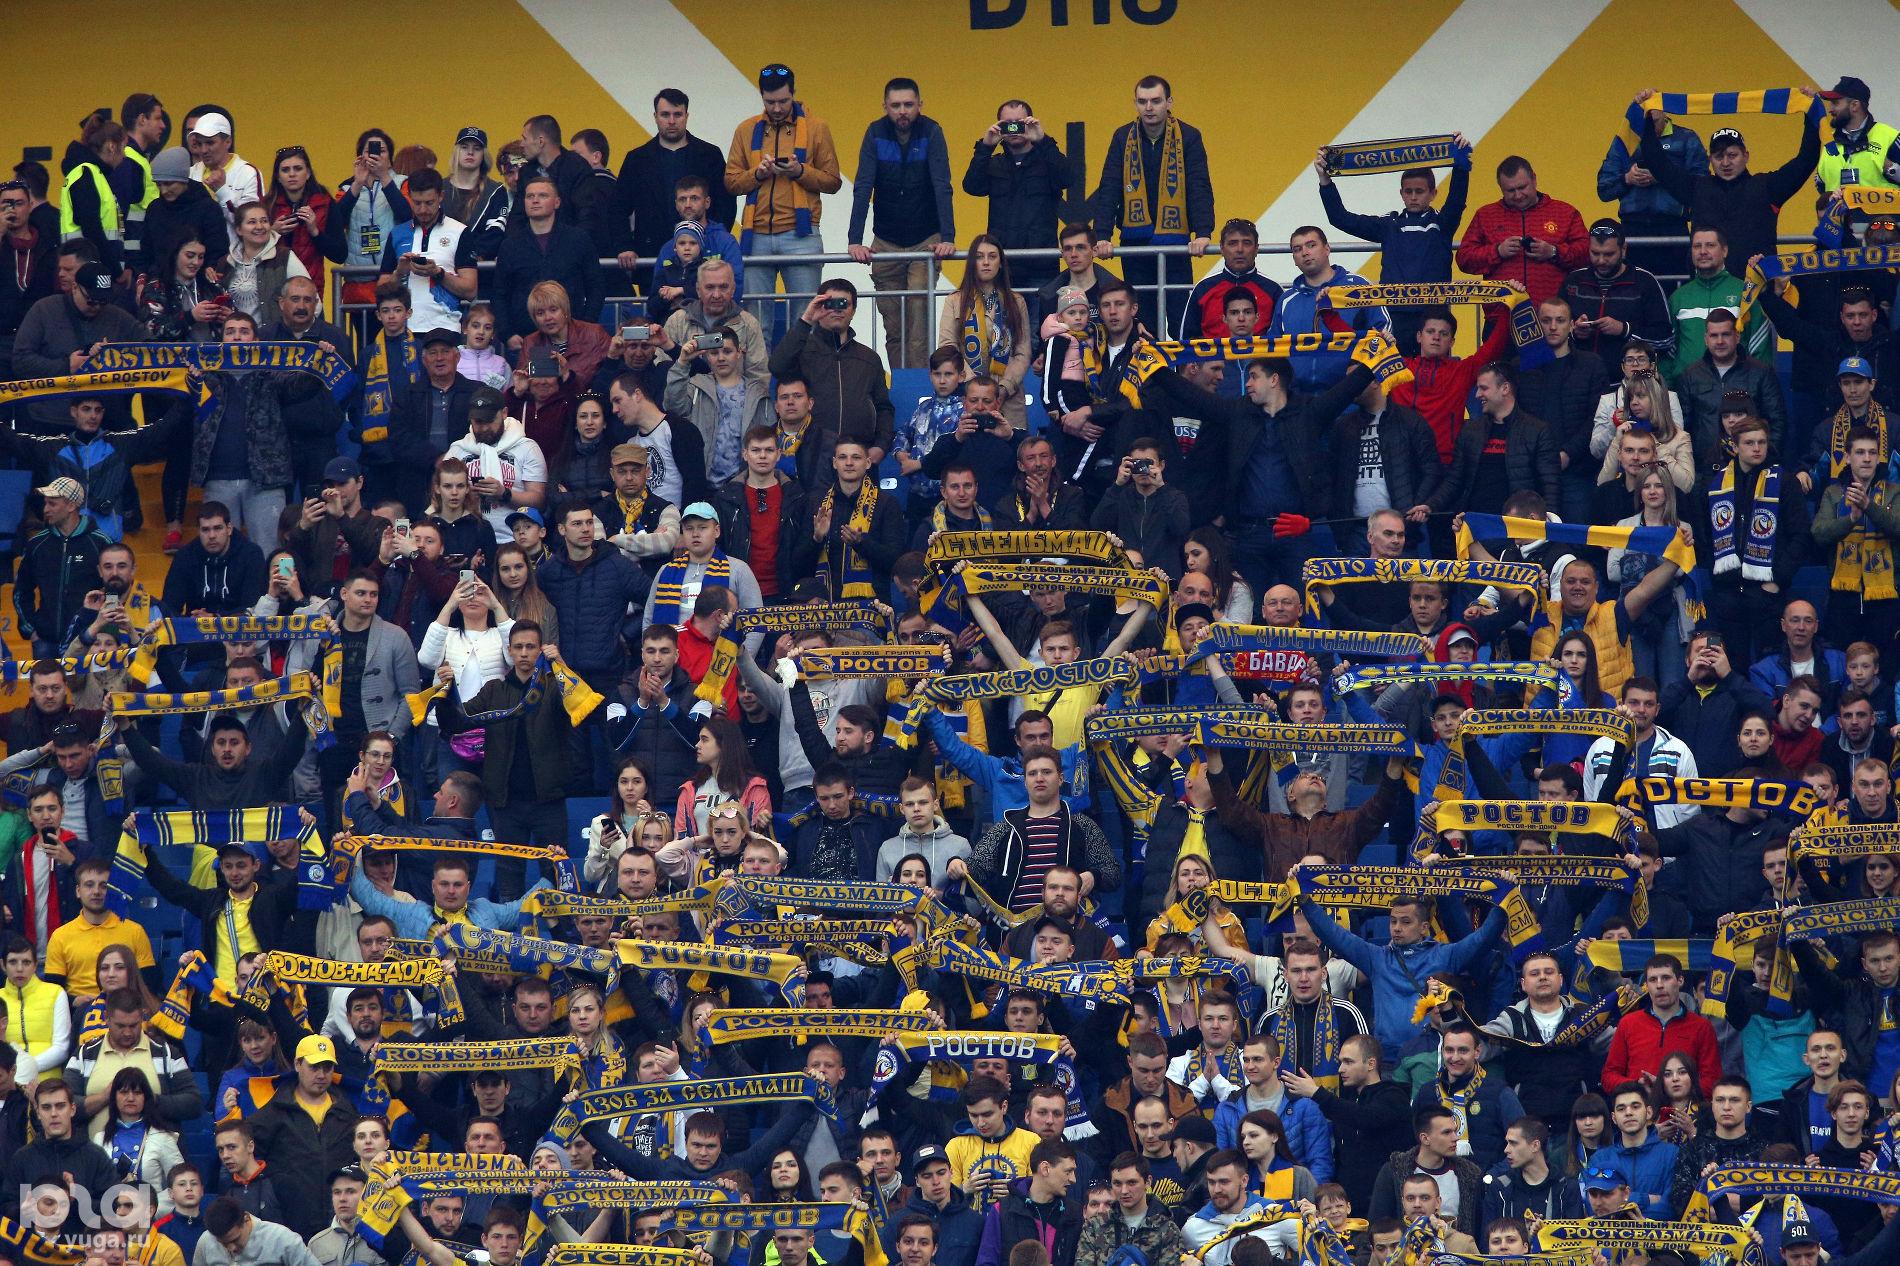 Болельщики на стадионе «Ростов-Арена» ©Фото Виталия Тимкива, Юга.ру